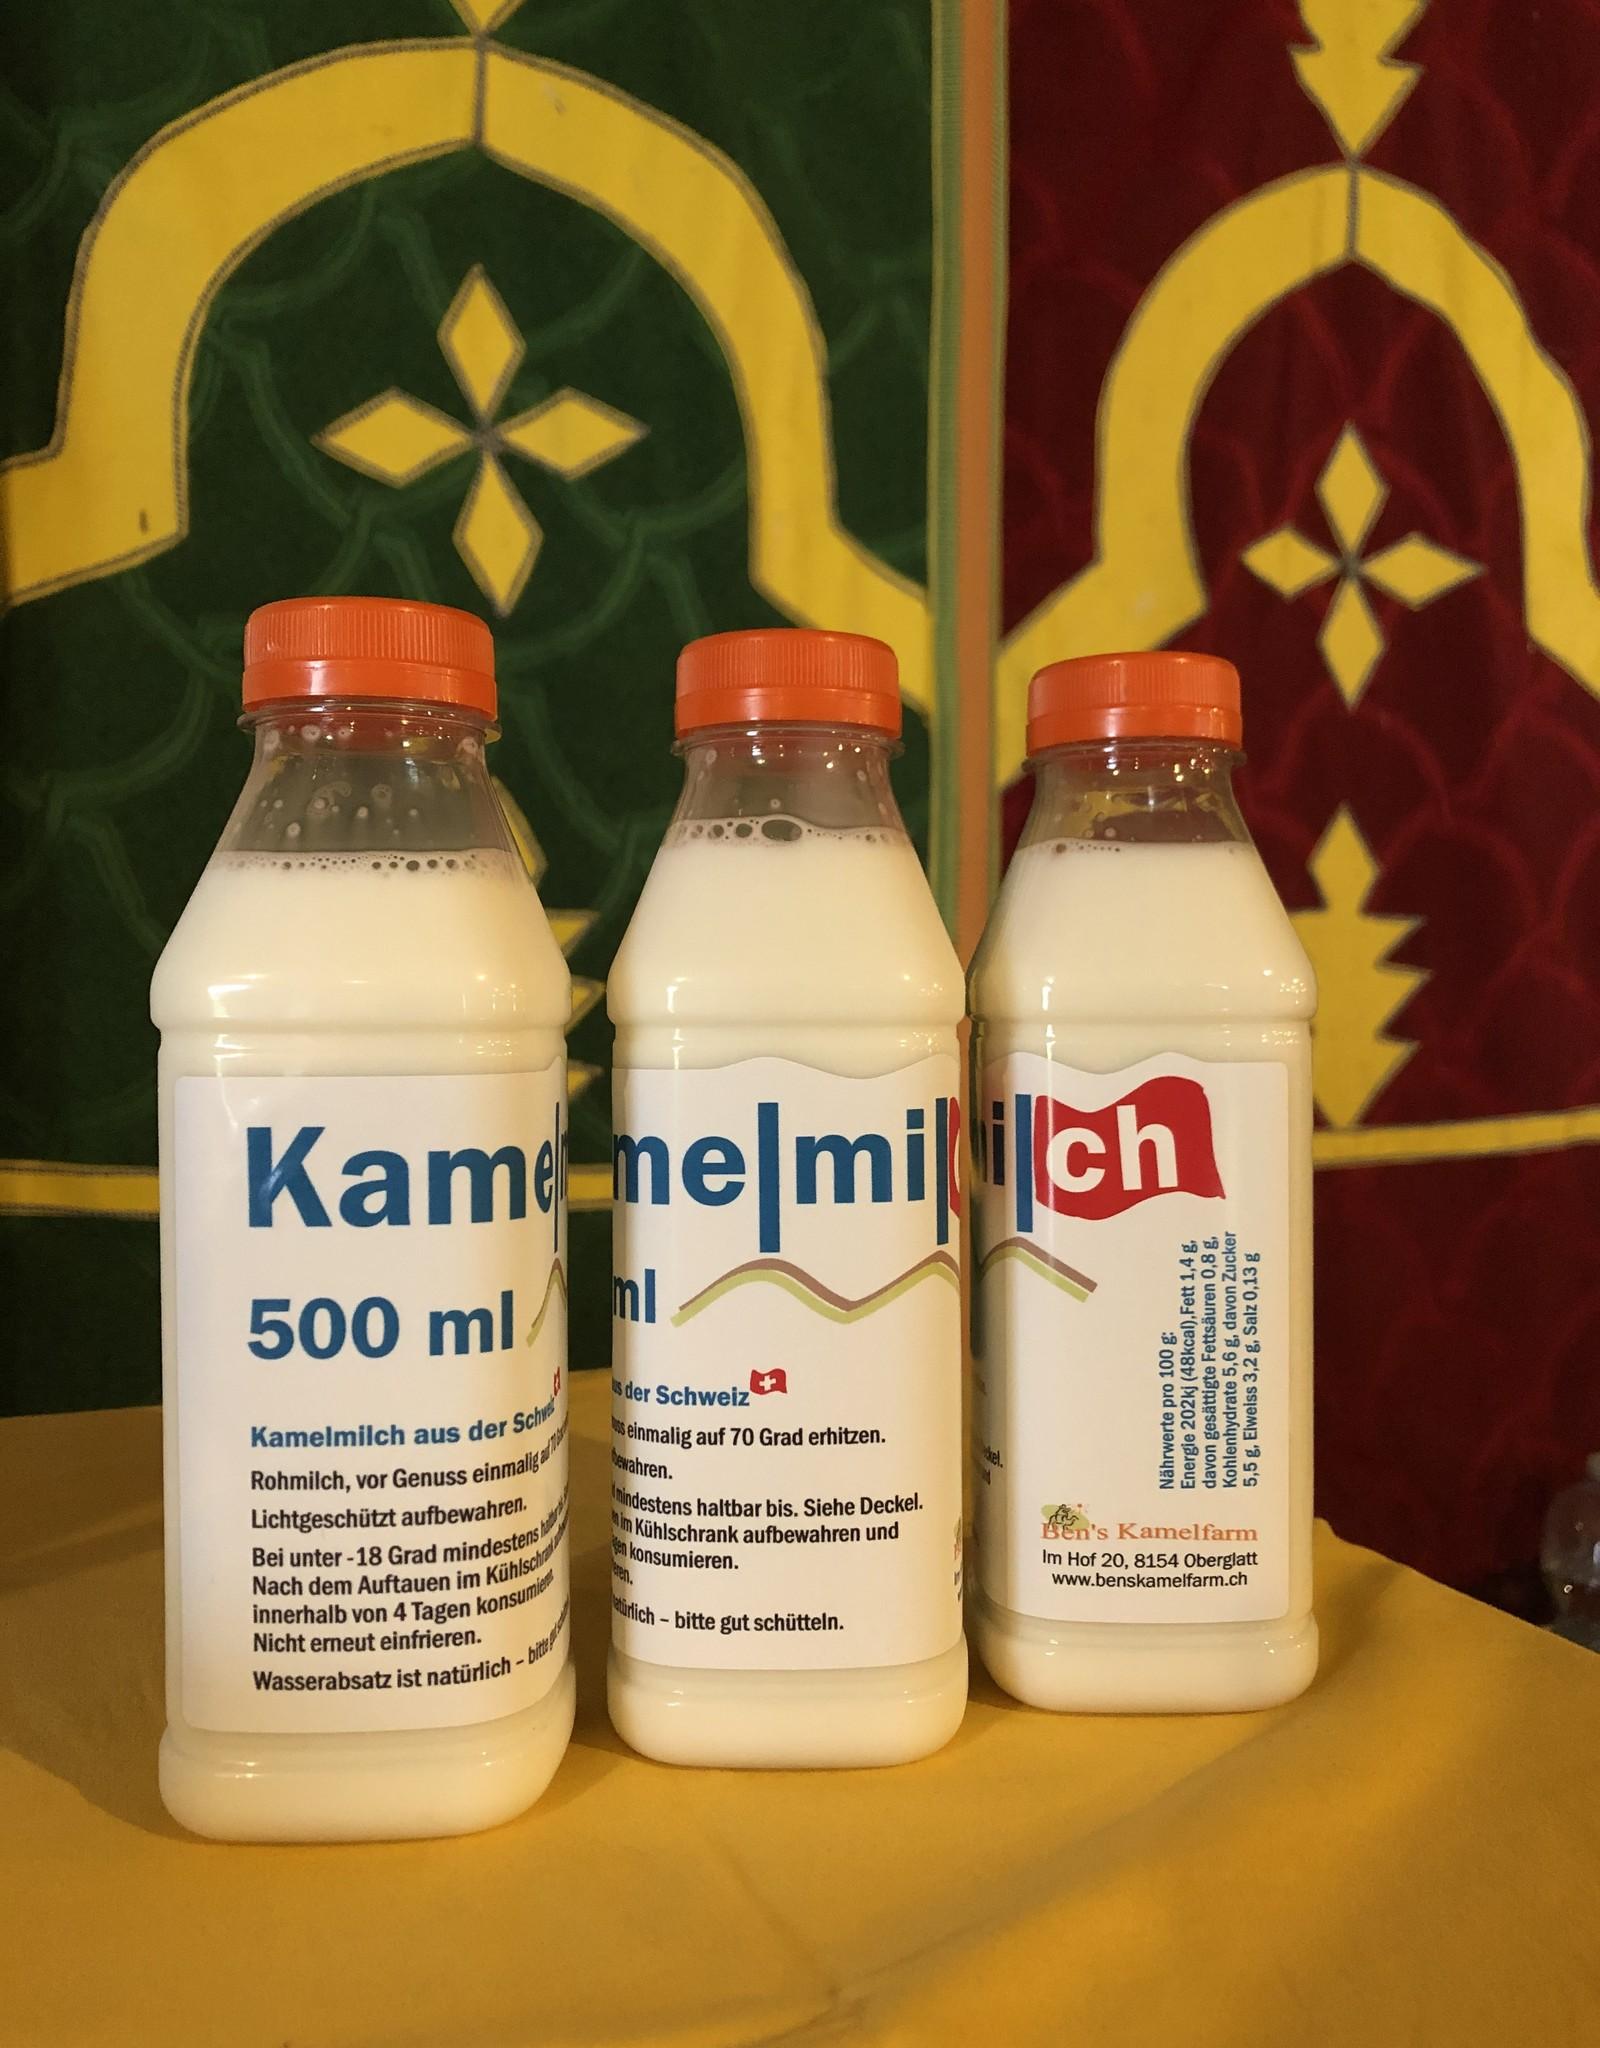 8 Liter Kamelmilch, roh, unbehandelt, tiefgefroren